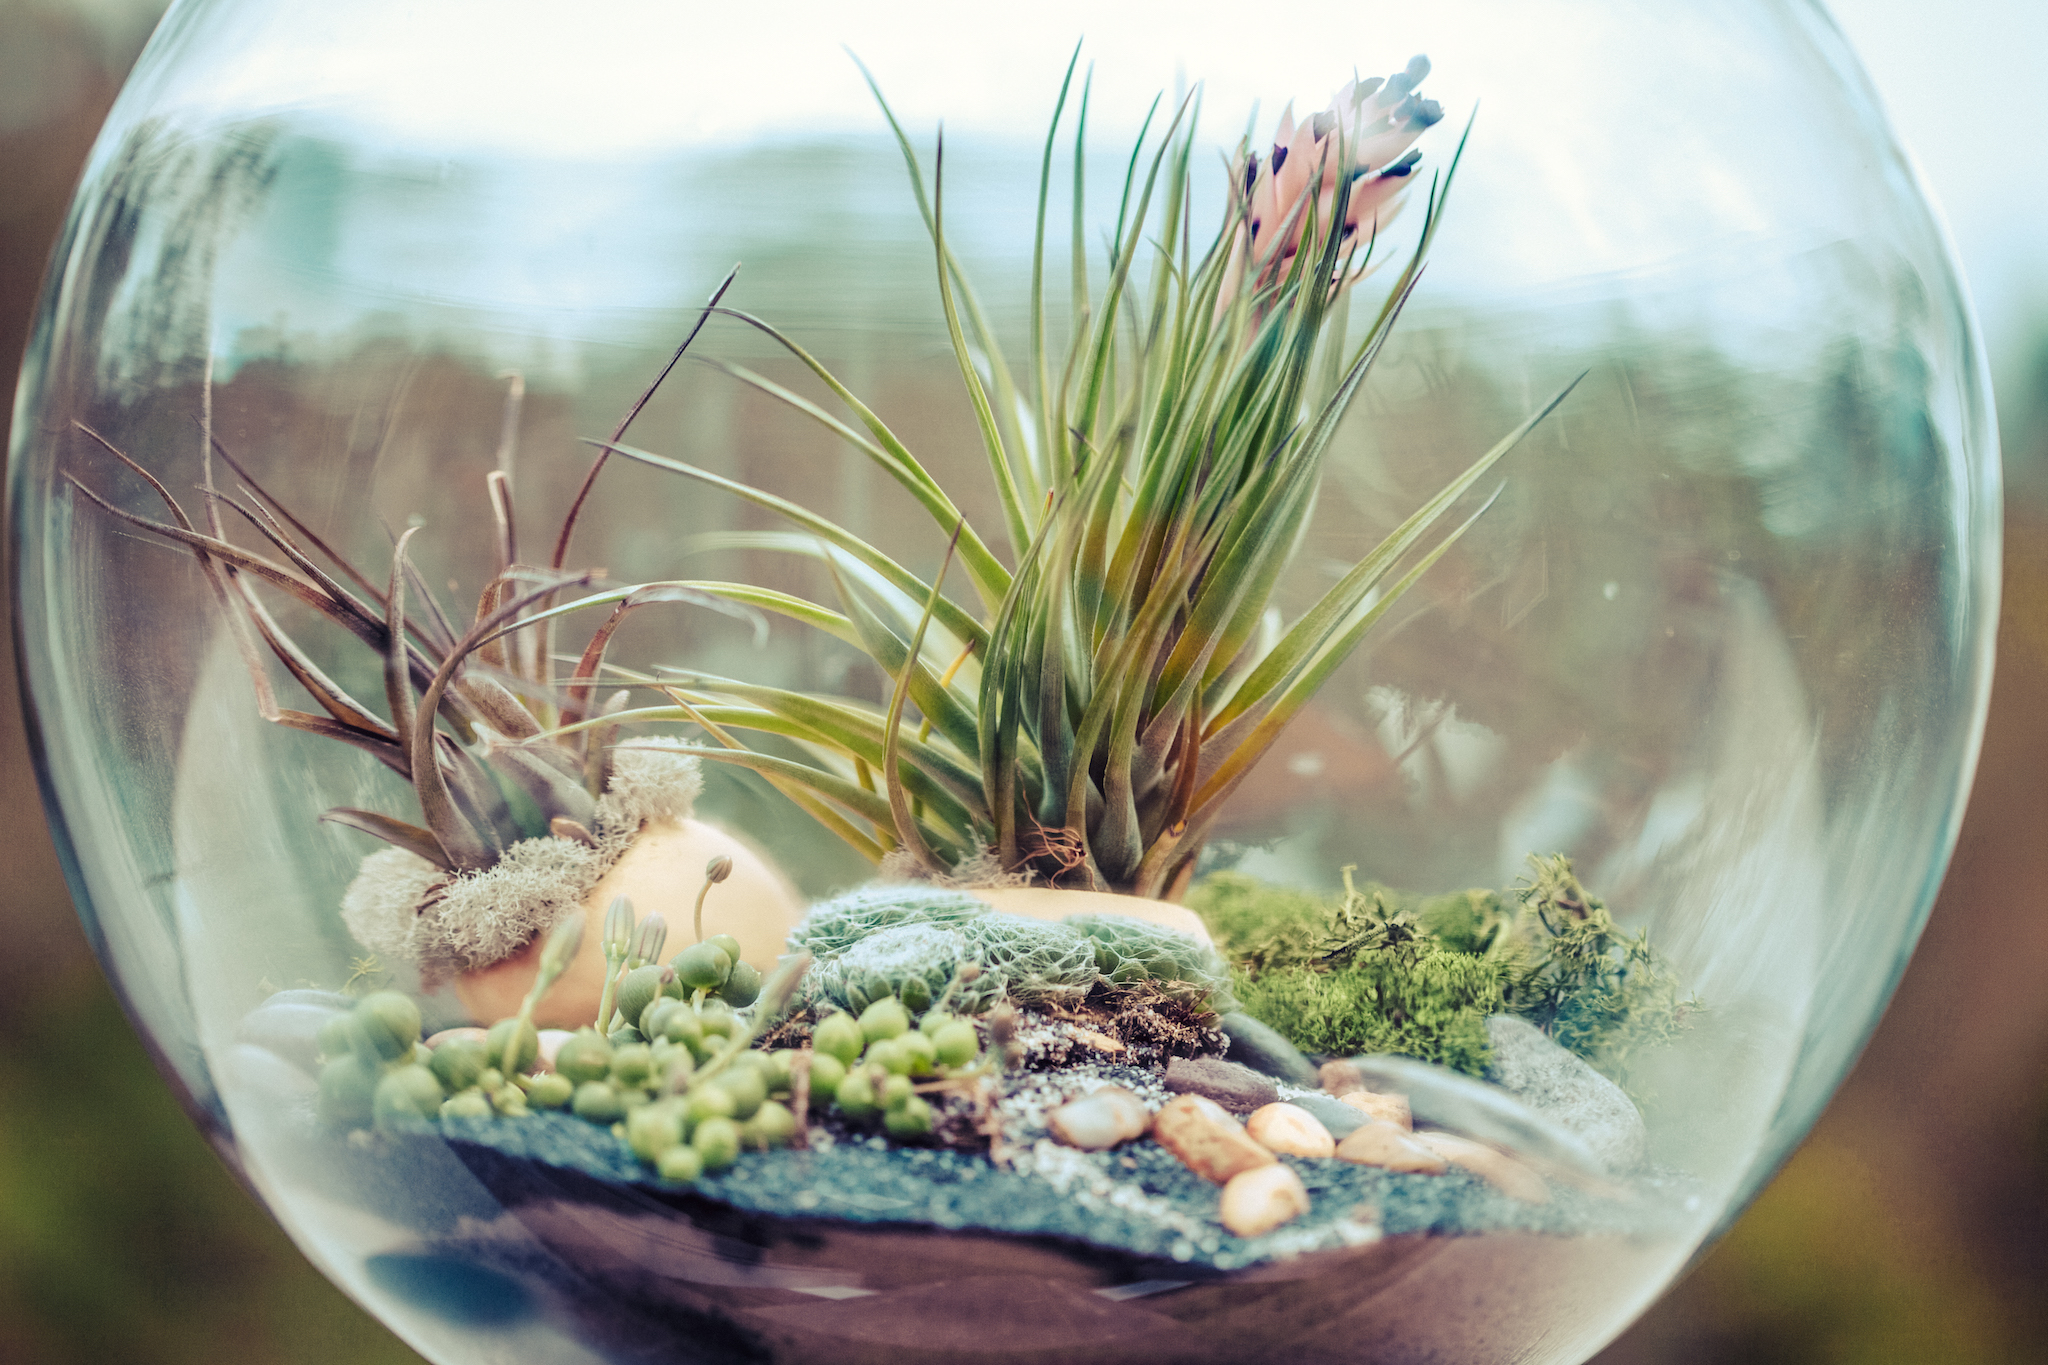 Create your own miniature terrarium